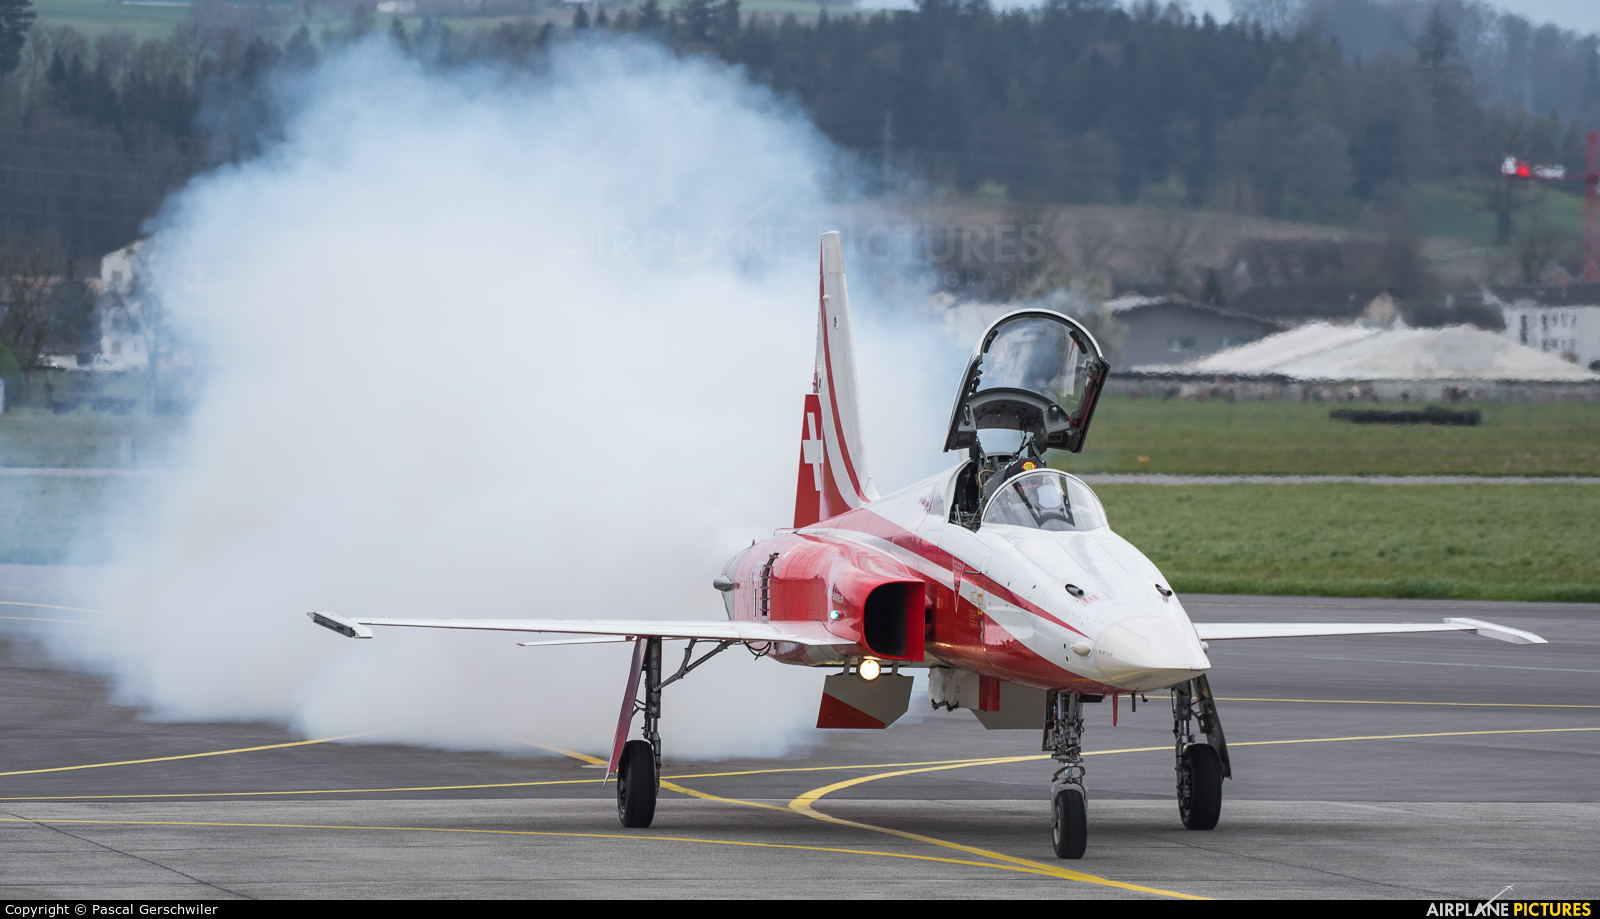 Switzerland - Air Force: Patrouille Suisse J-3085 aircraft at Emmen